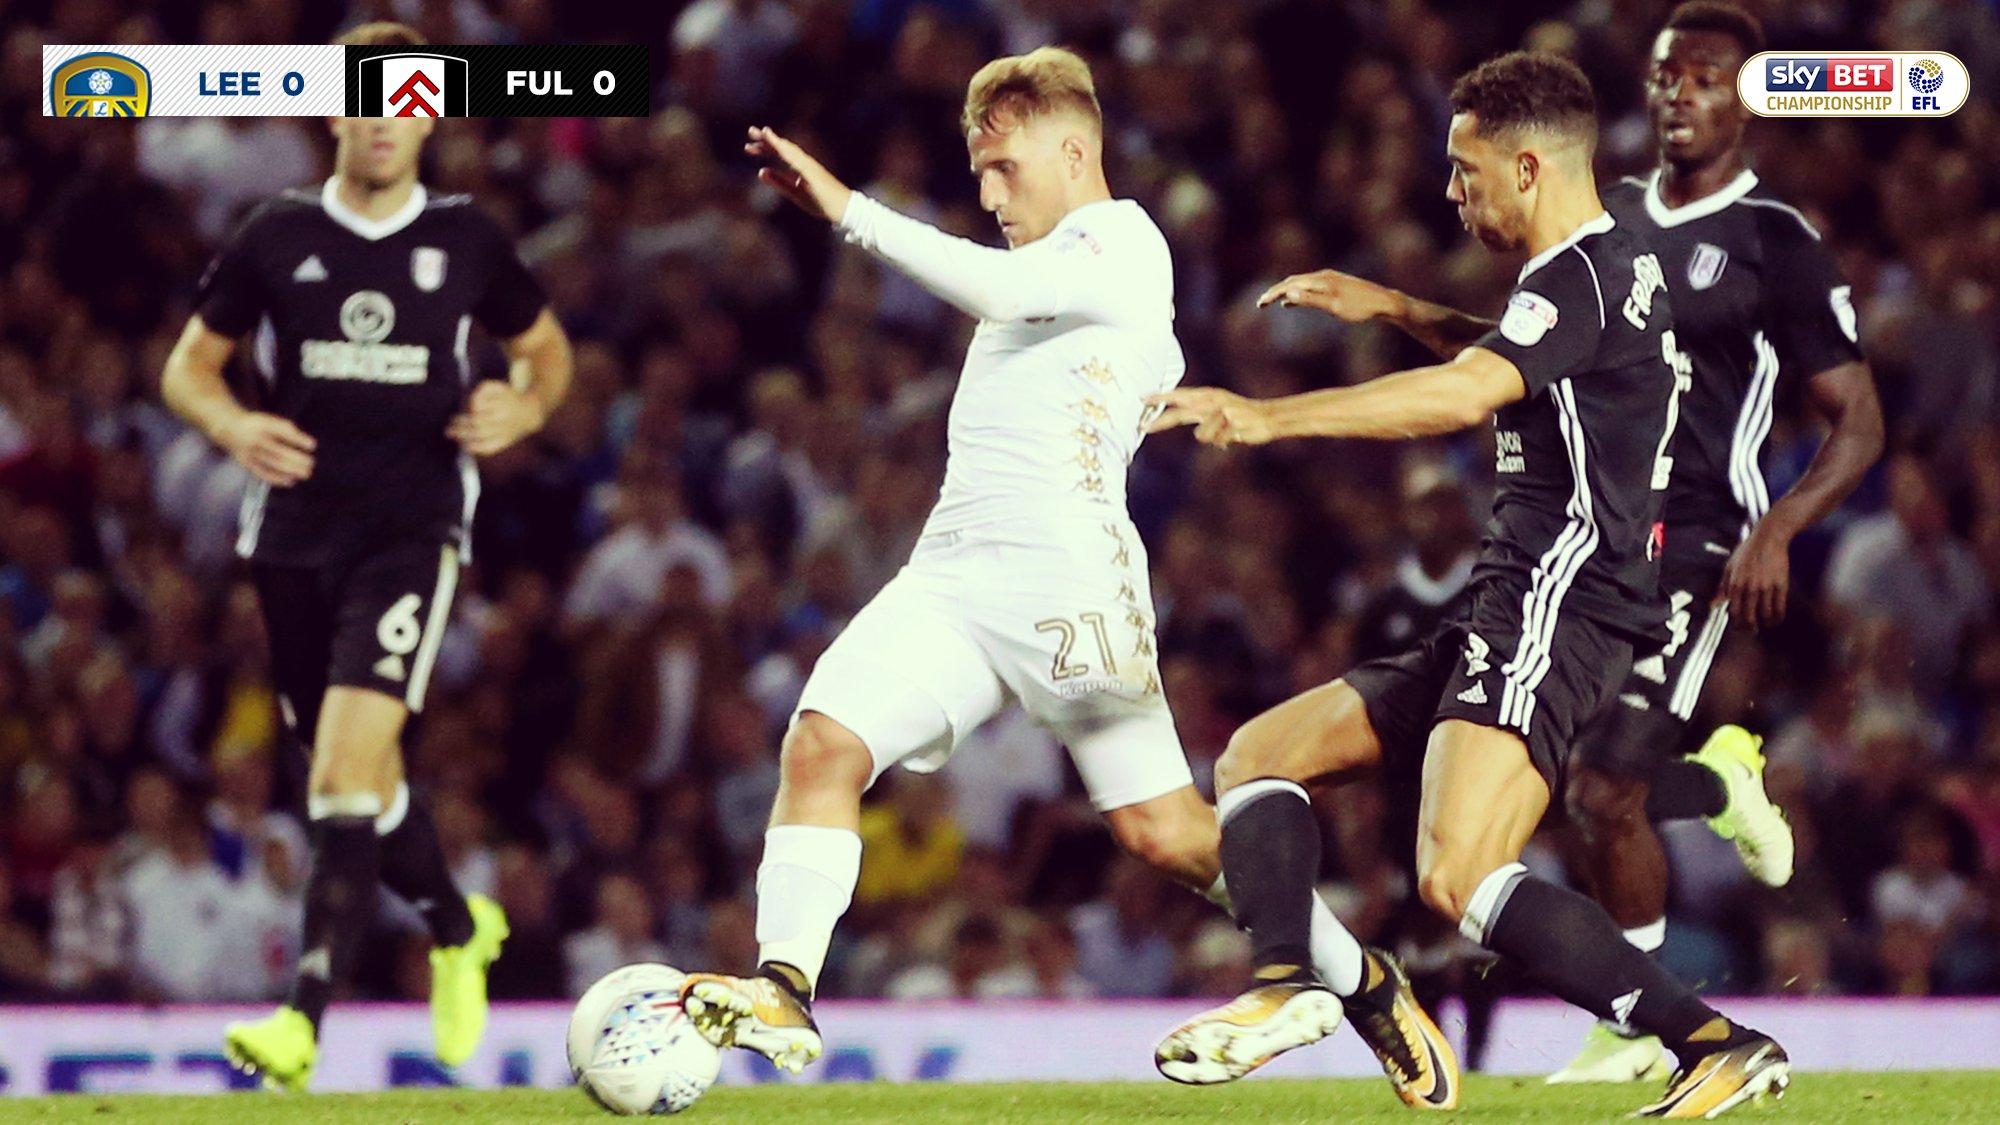 Leeds – Fulham 0-0